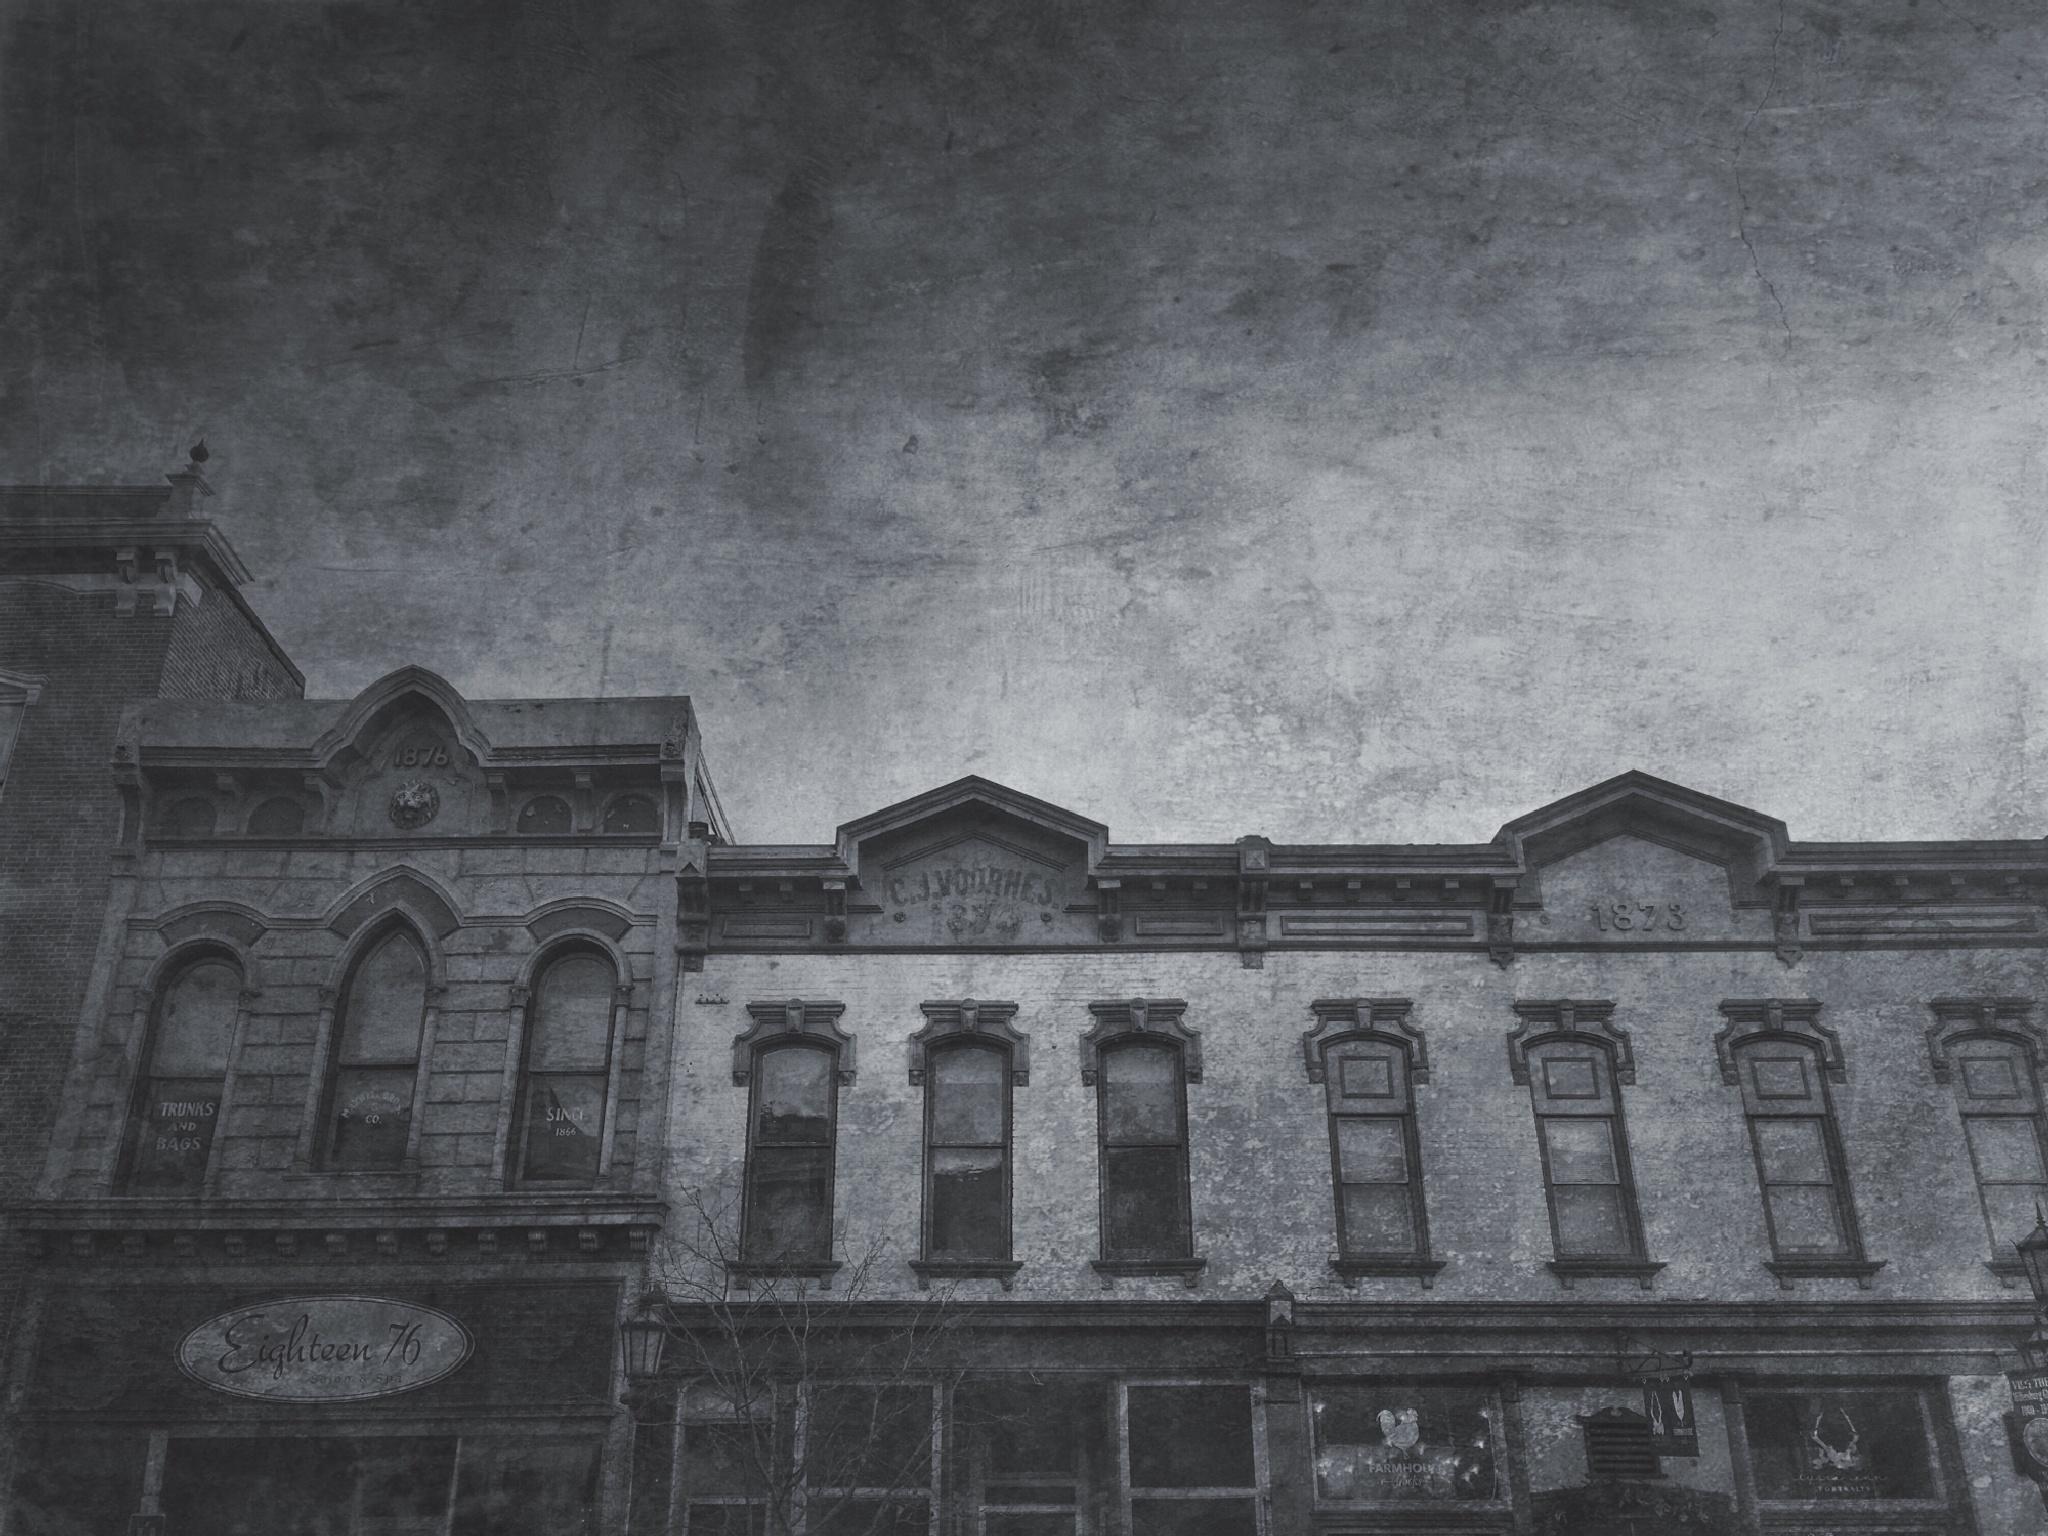 Downtown by mattdevore